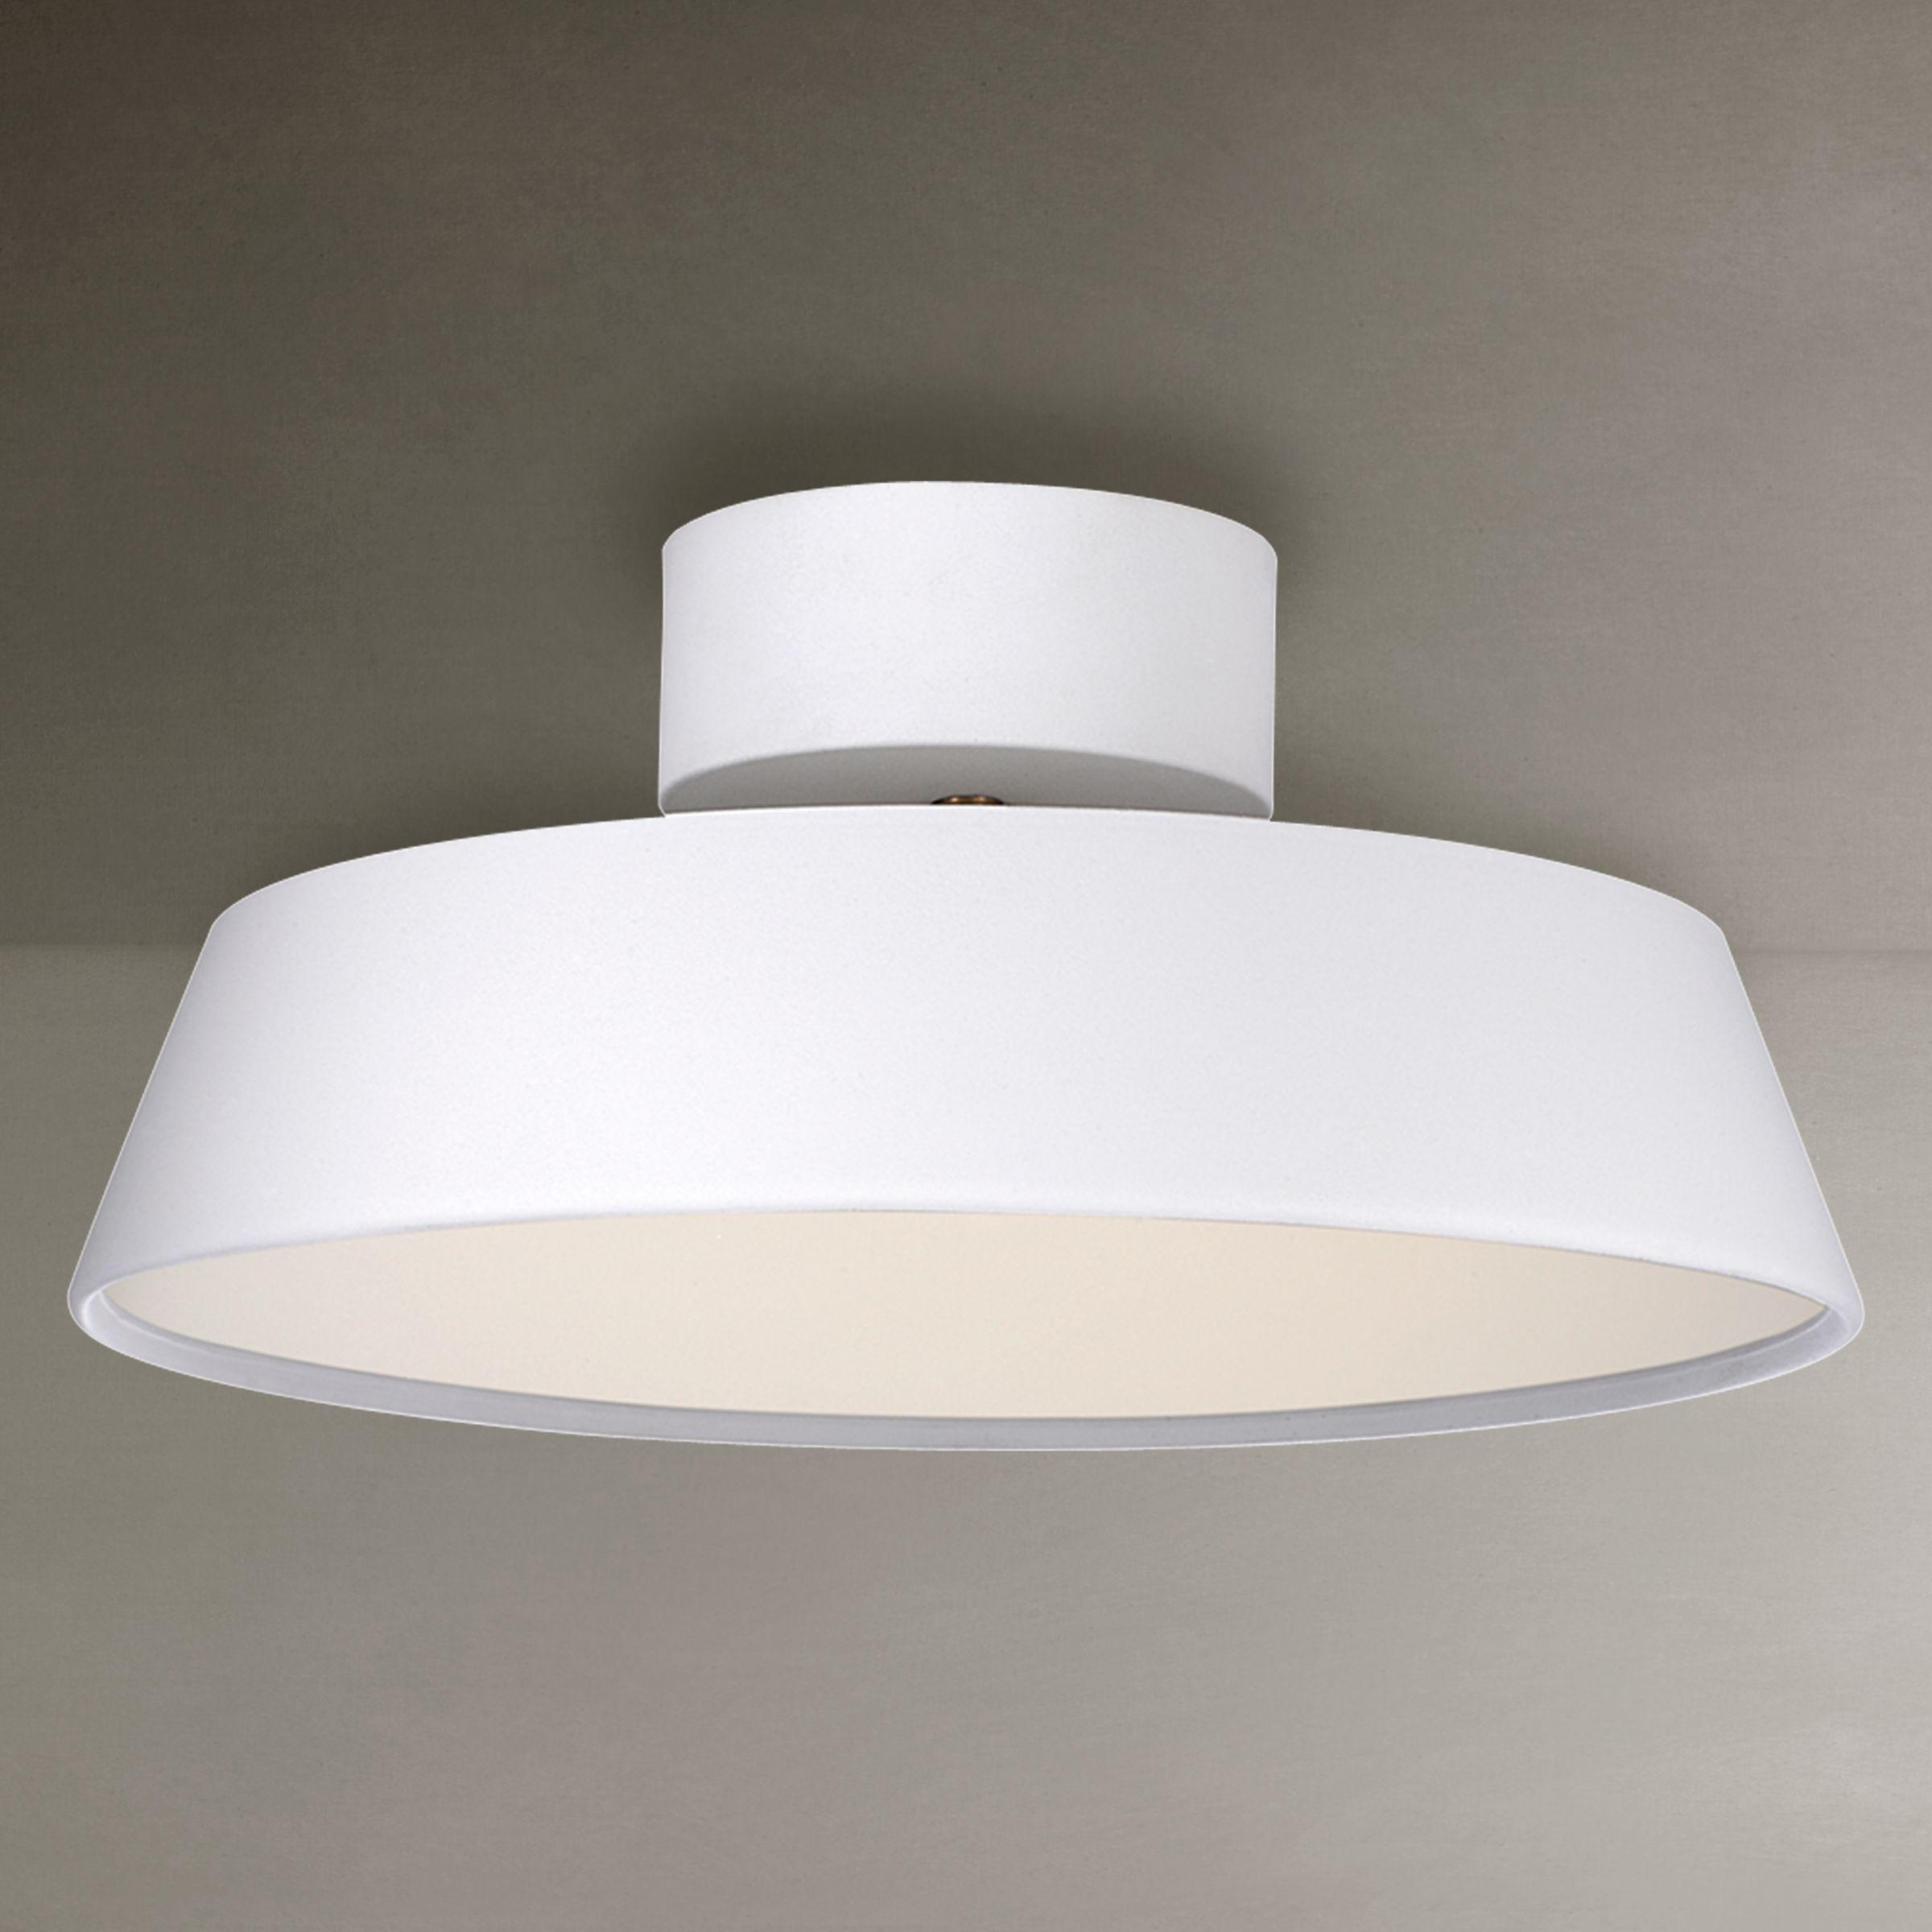 Nordlux Nordlux Alba LED Adjustable Tilt Semi-flush Ceiling Light